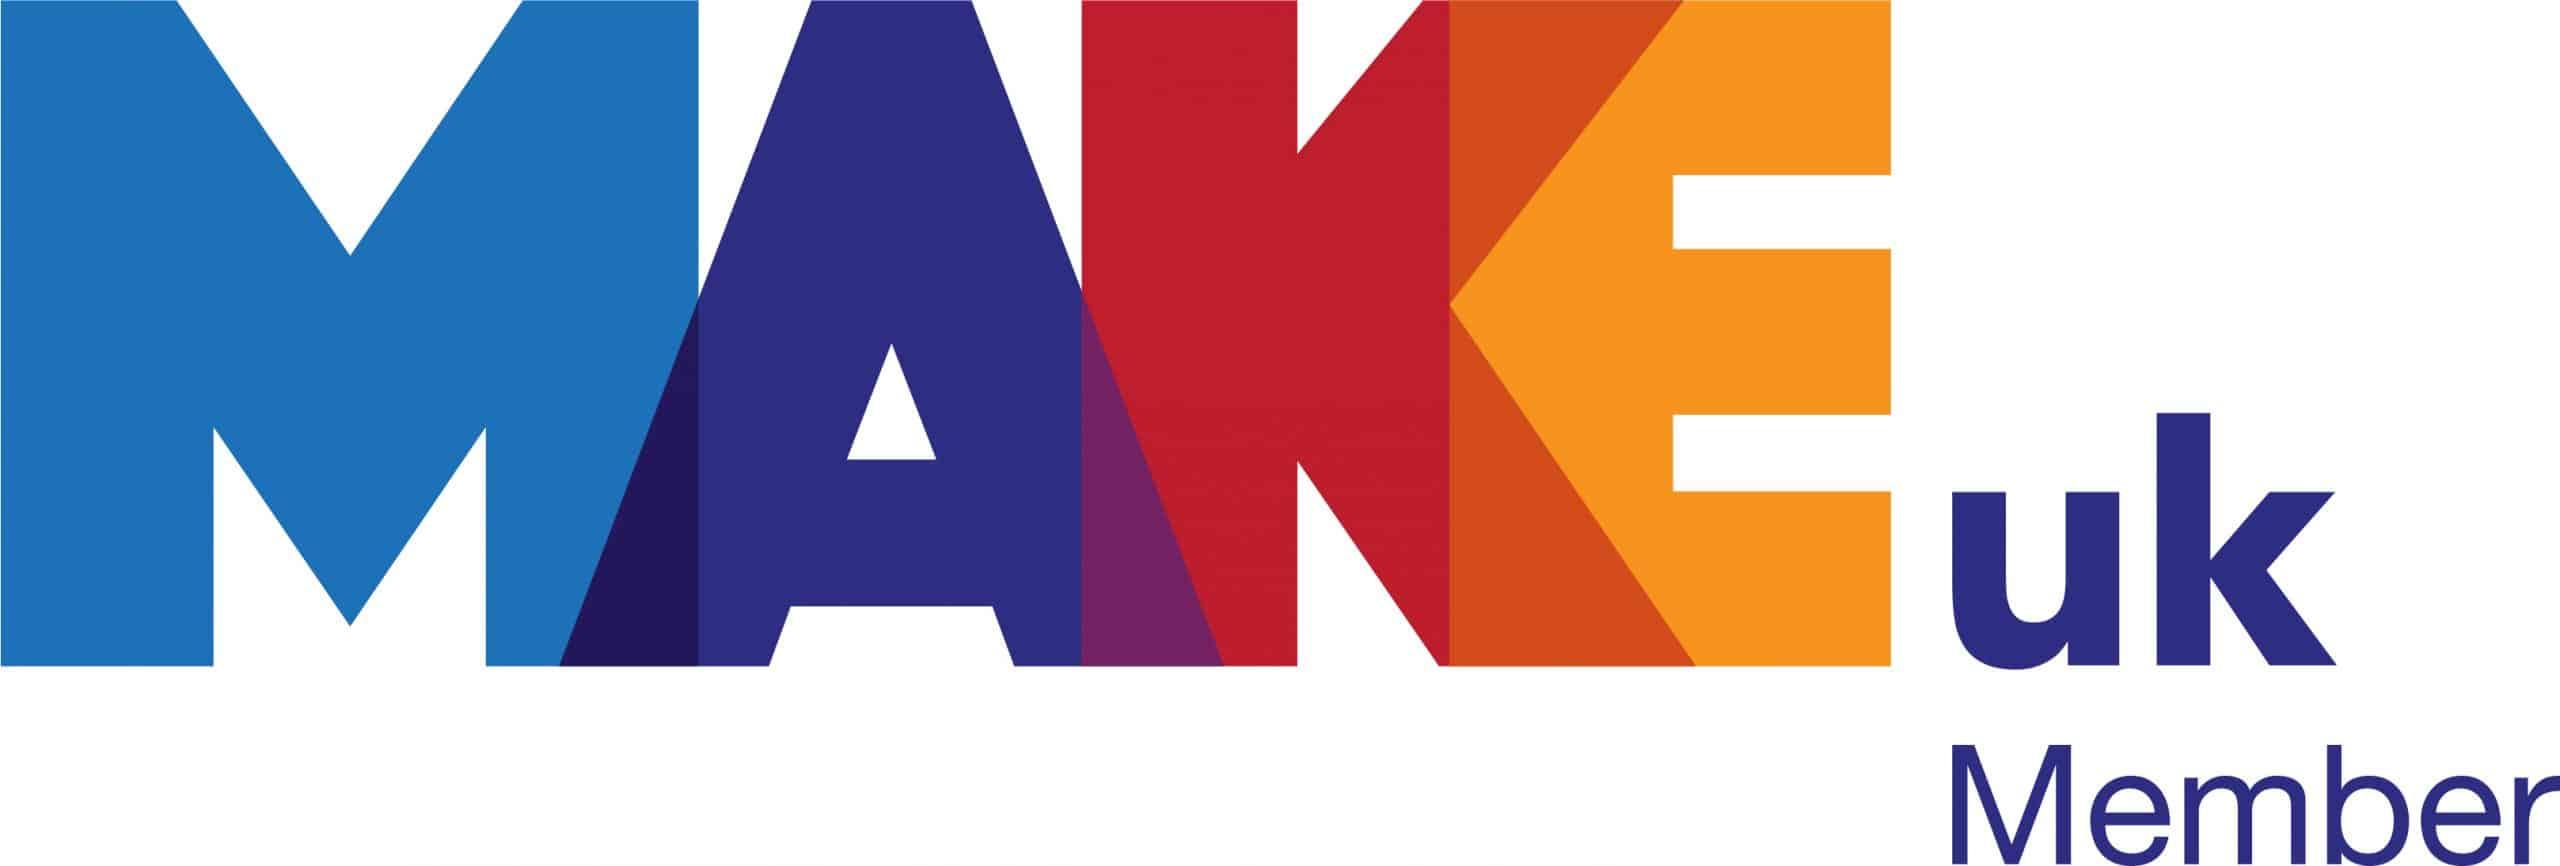 MAKE UK Member | Euroflow Automation Ltd